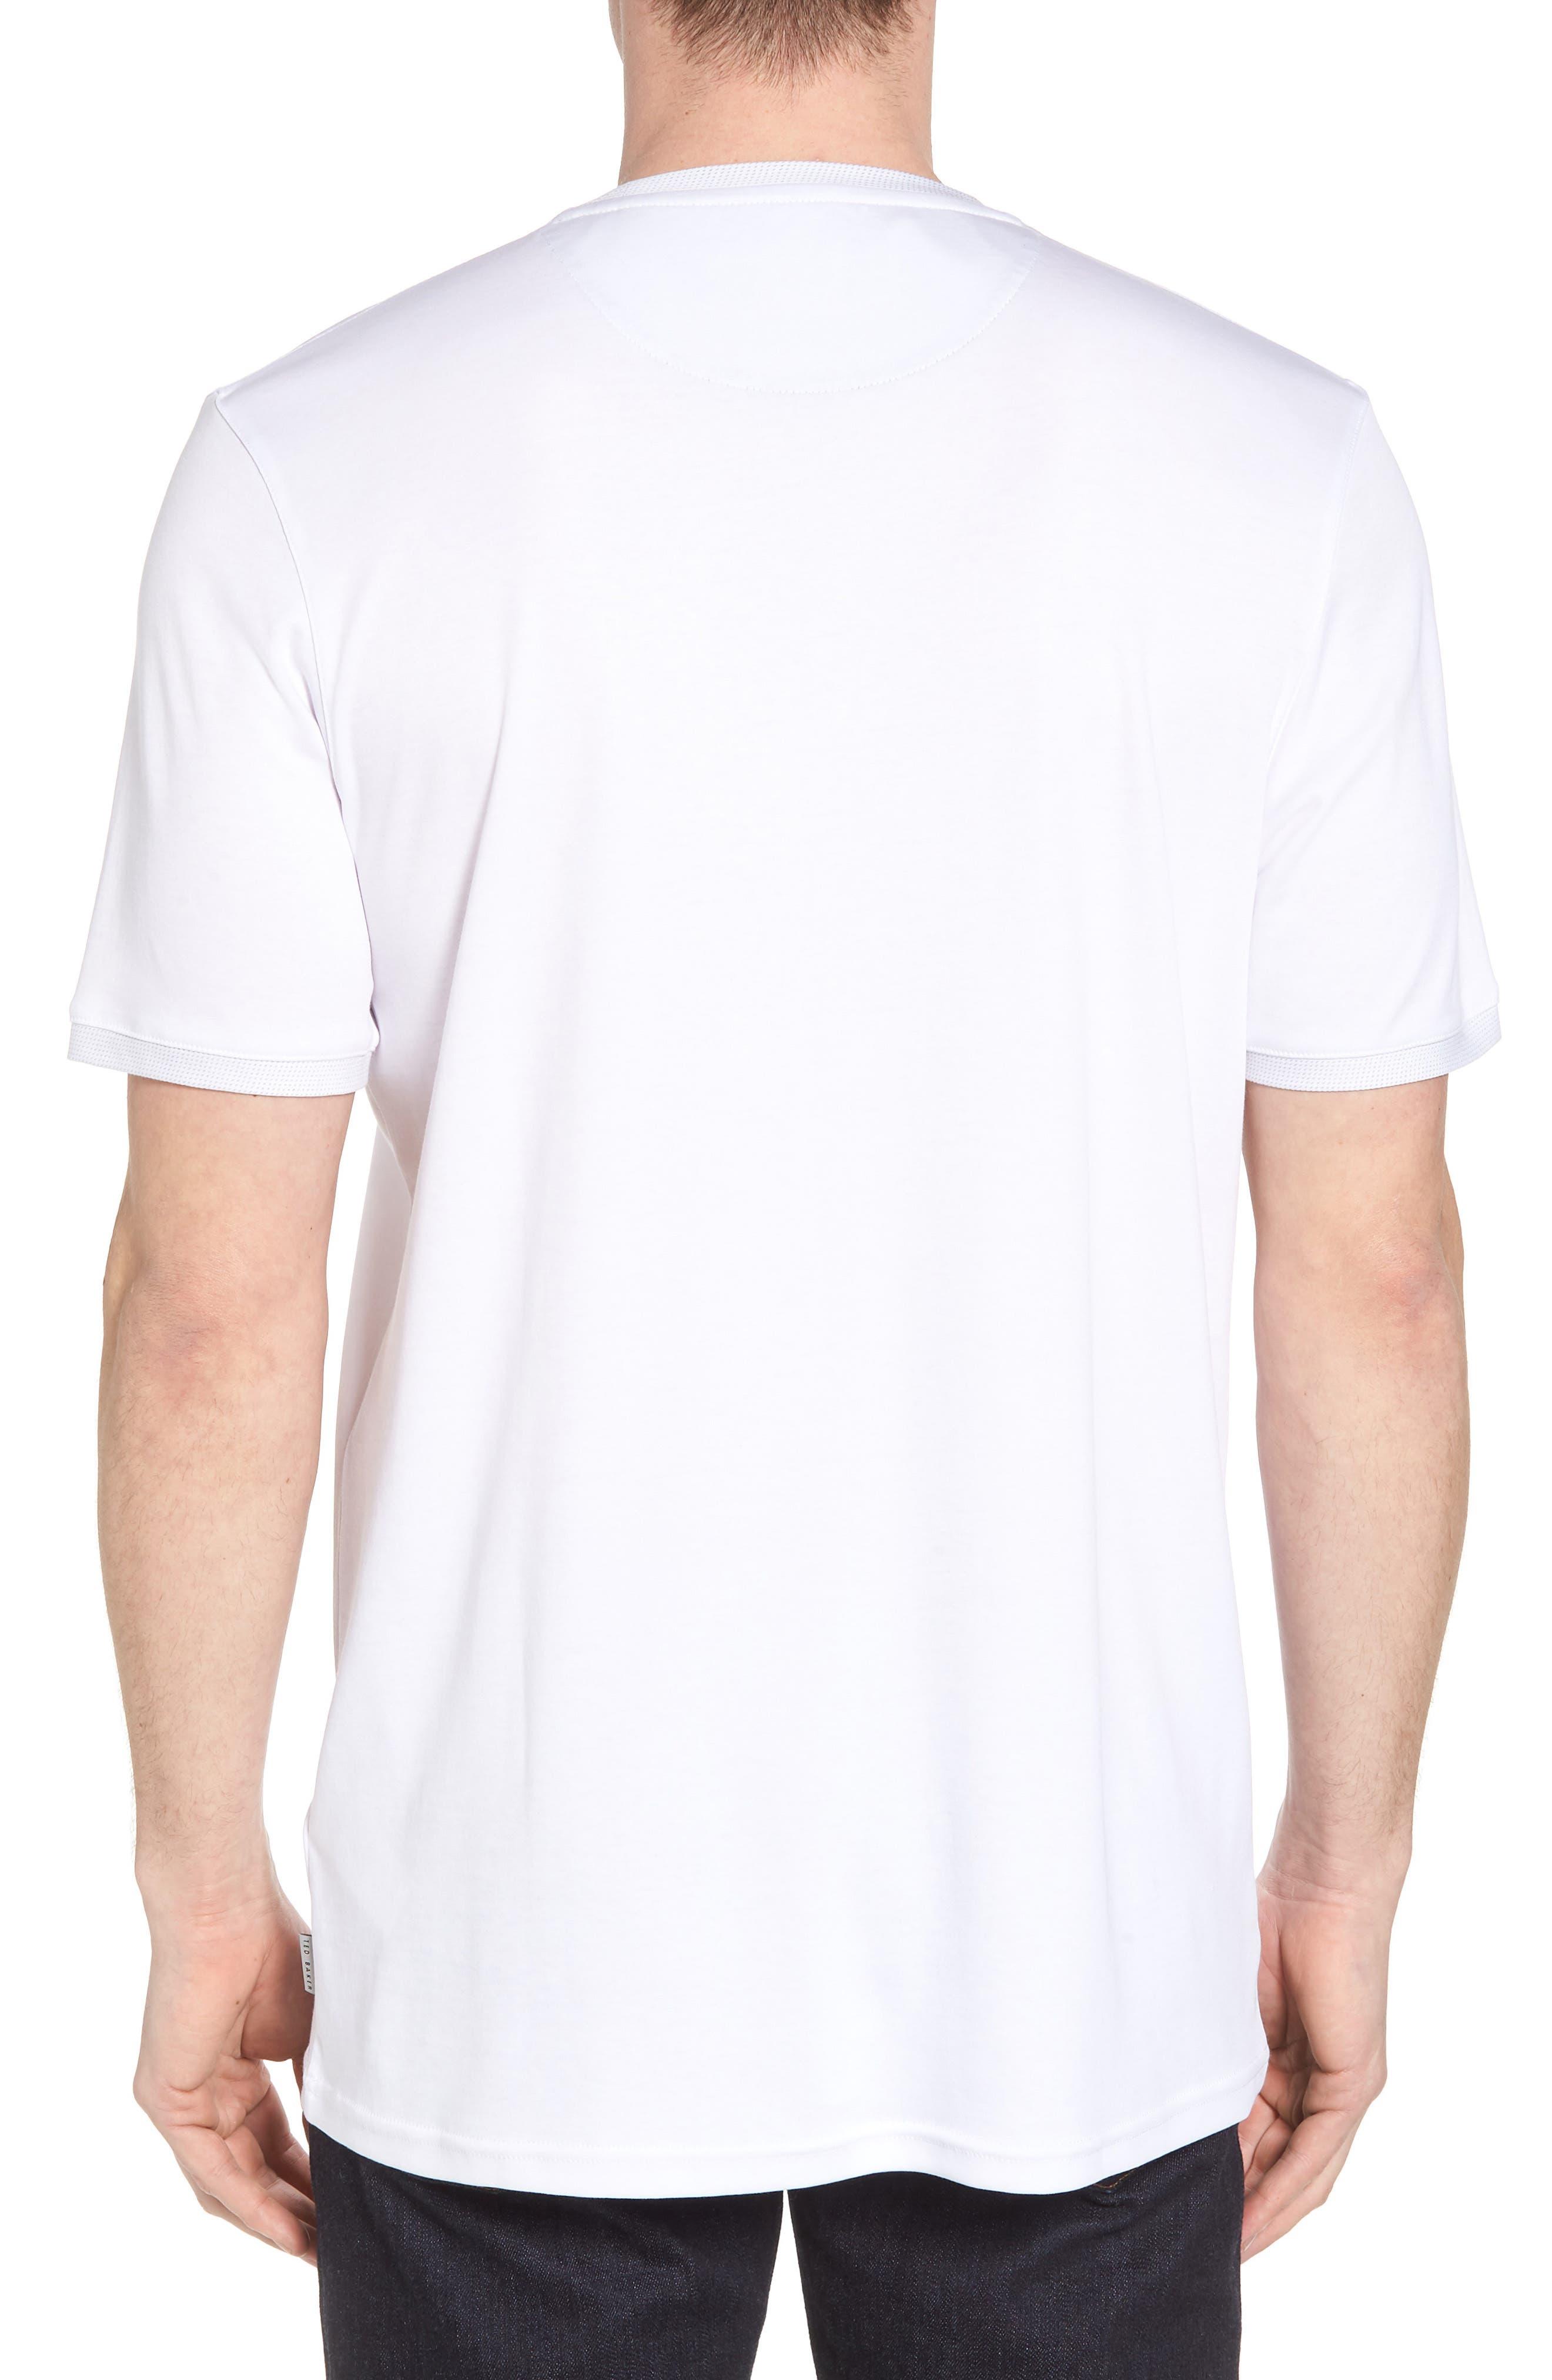 Piktt Crewneck T-Shirt,                             Alternate thumbnail 5, color,